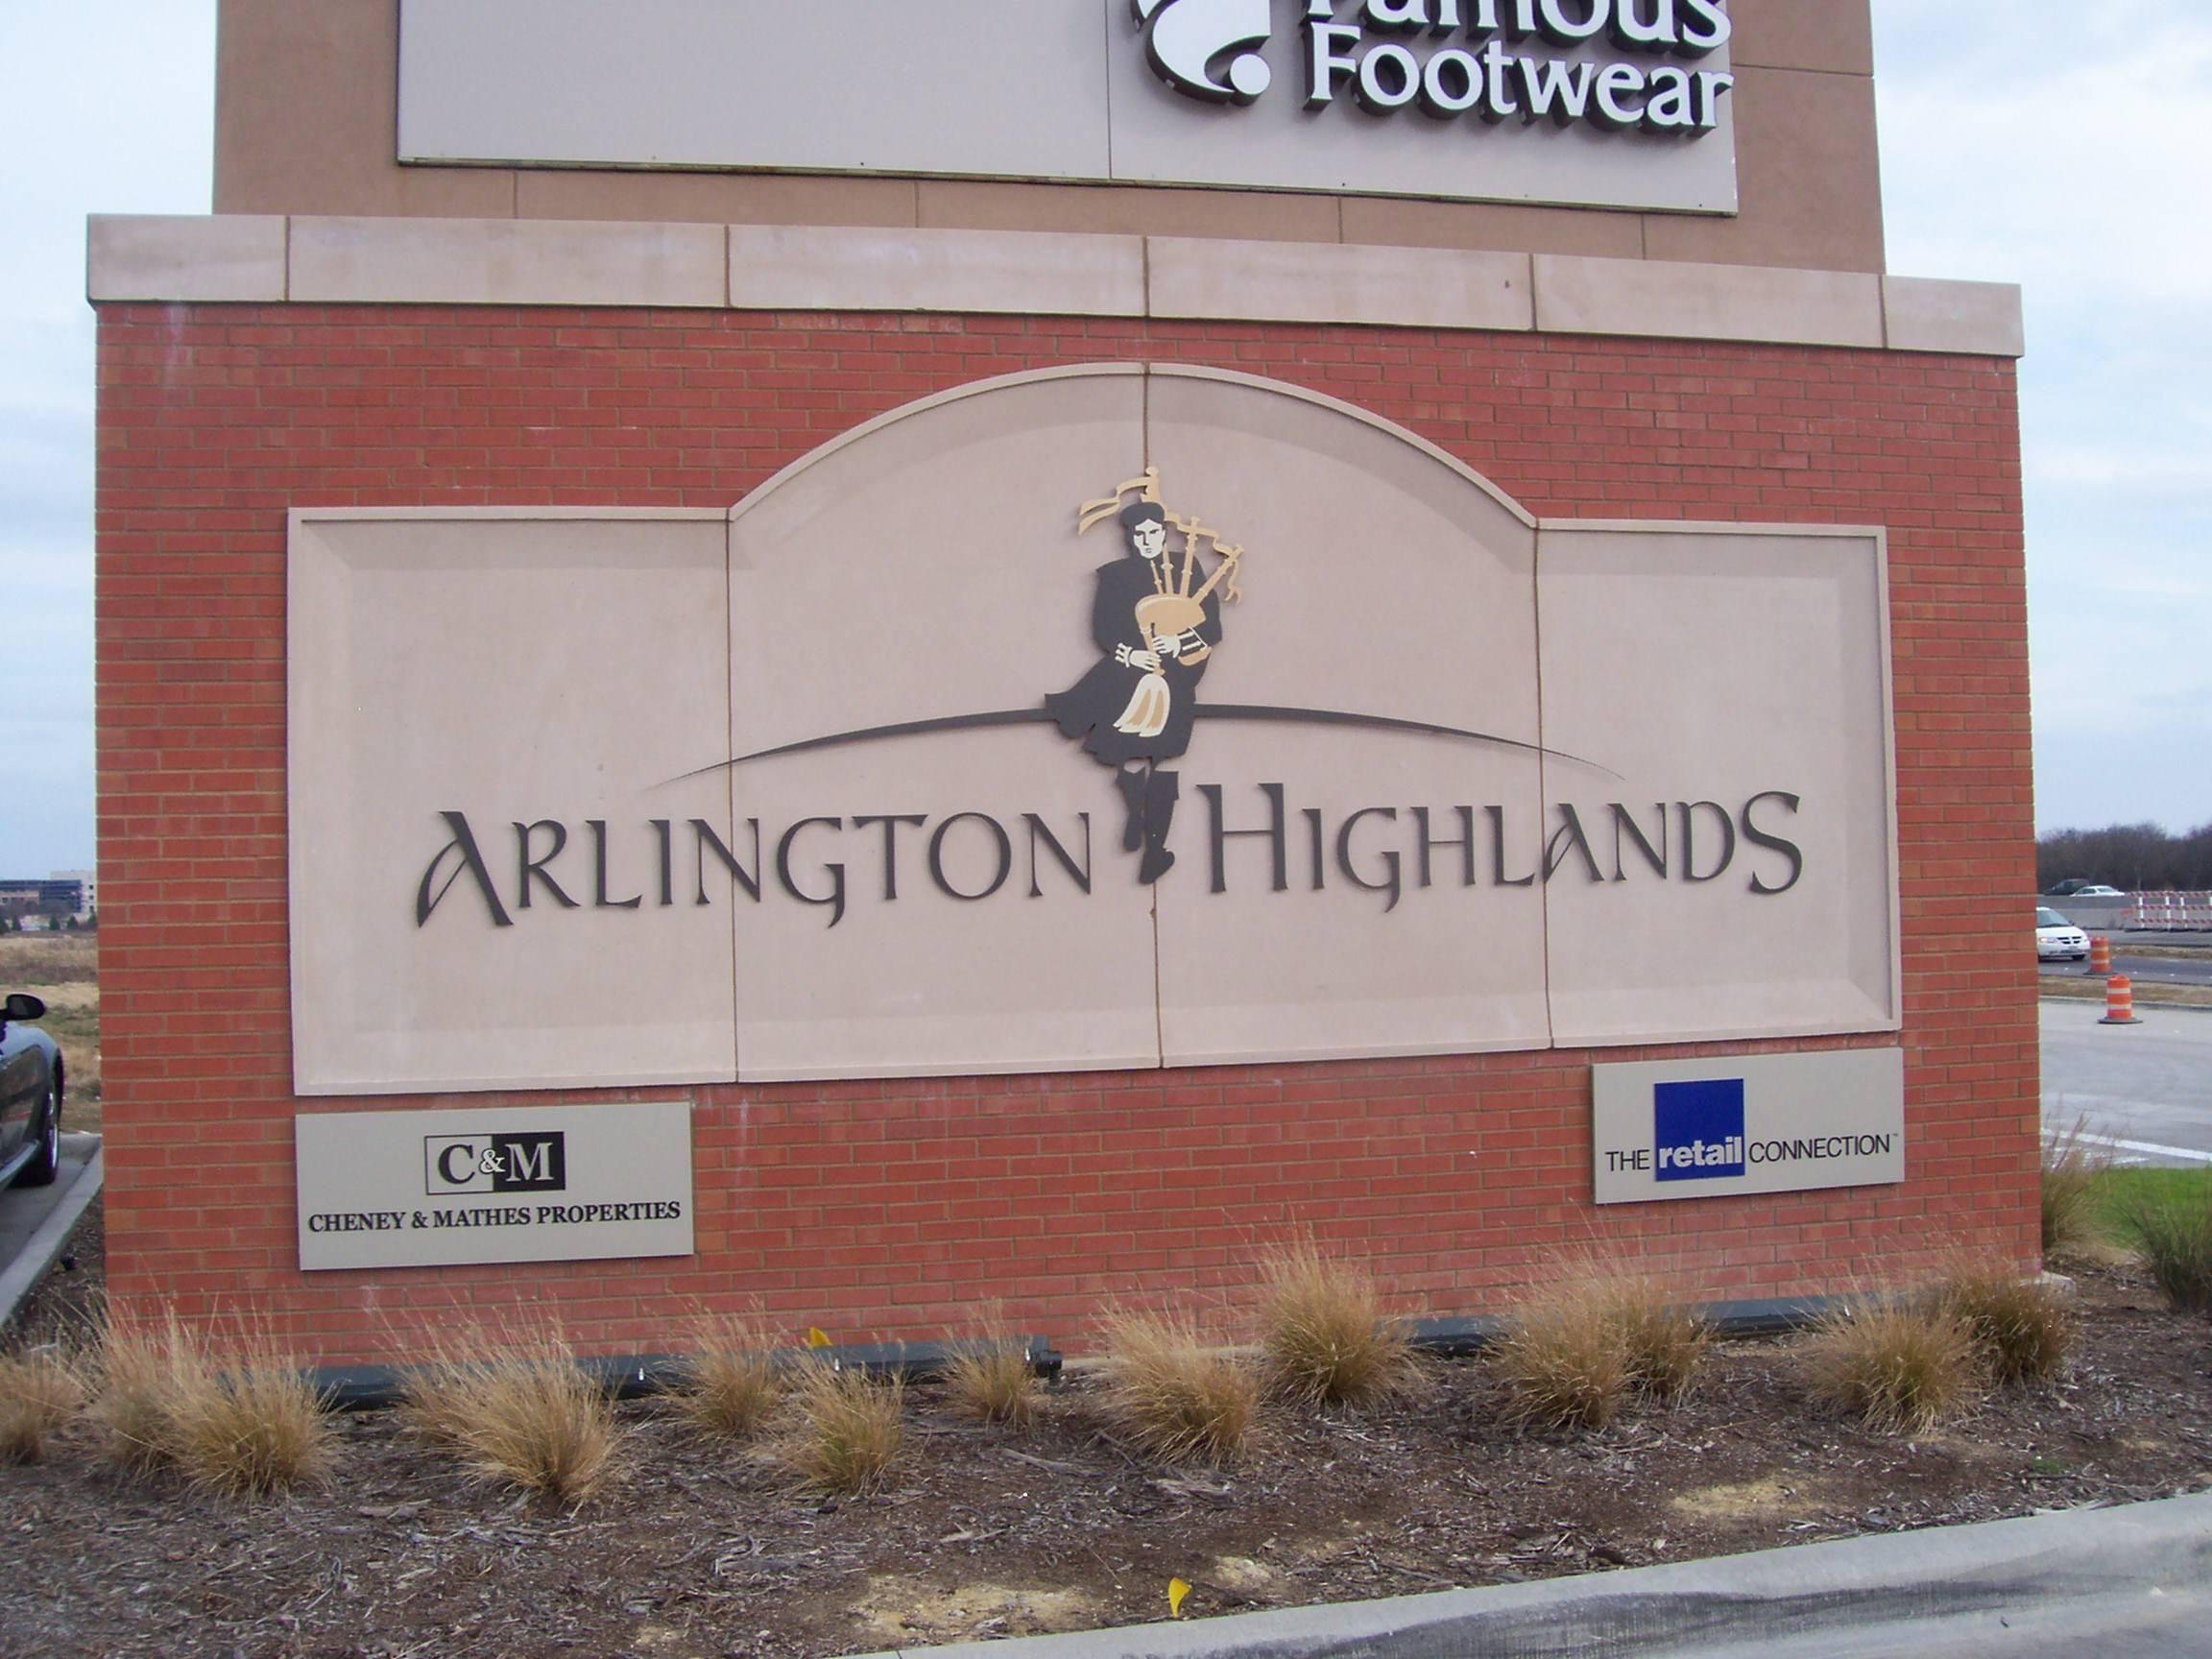 Arlington Highland